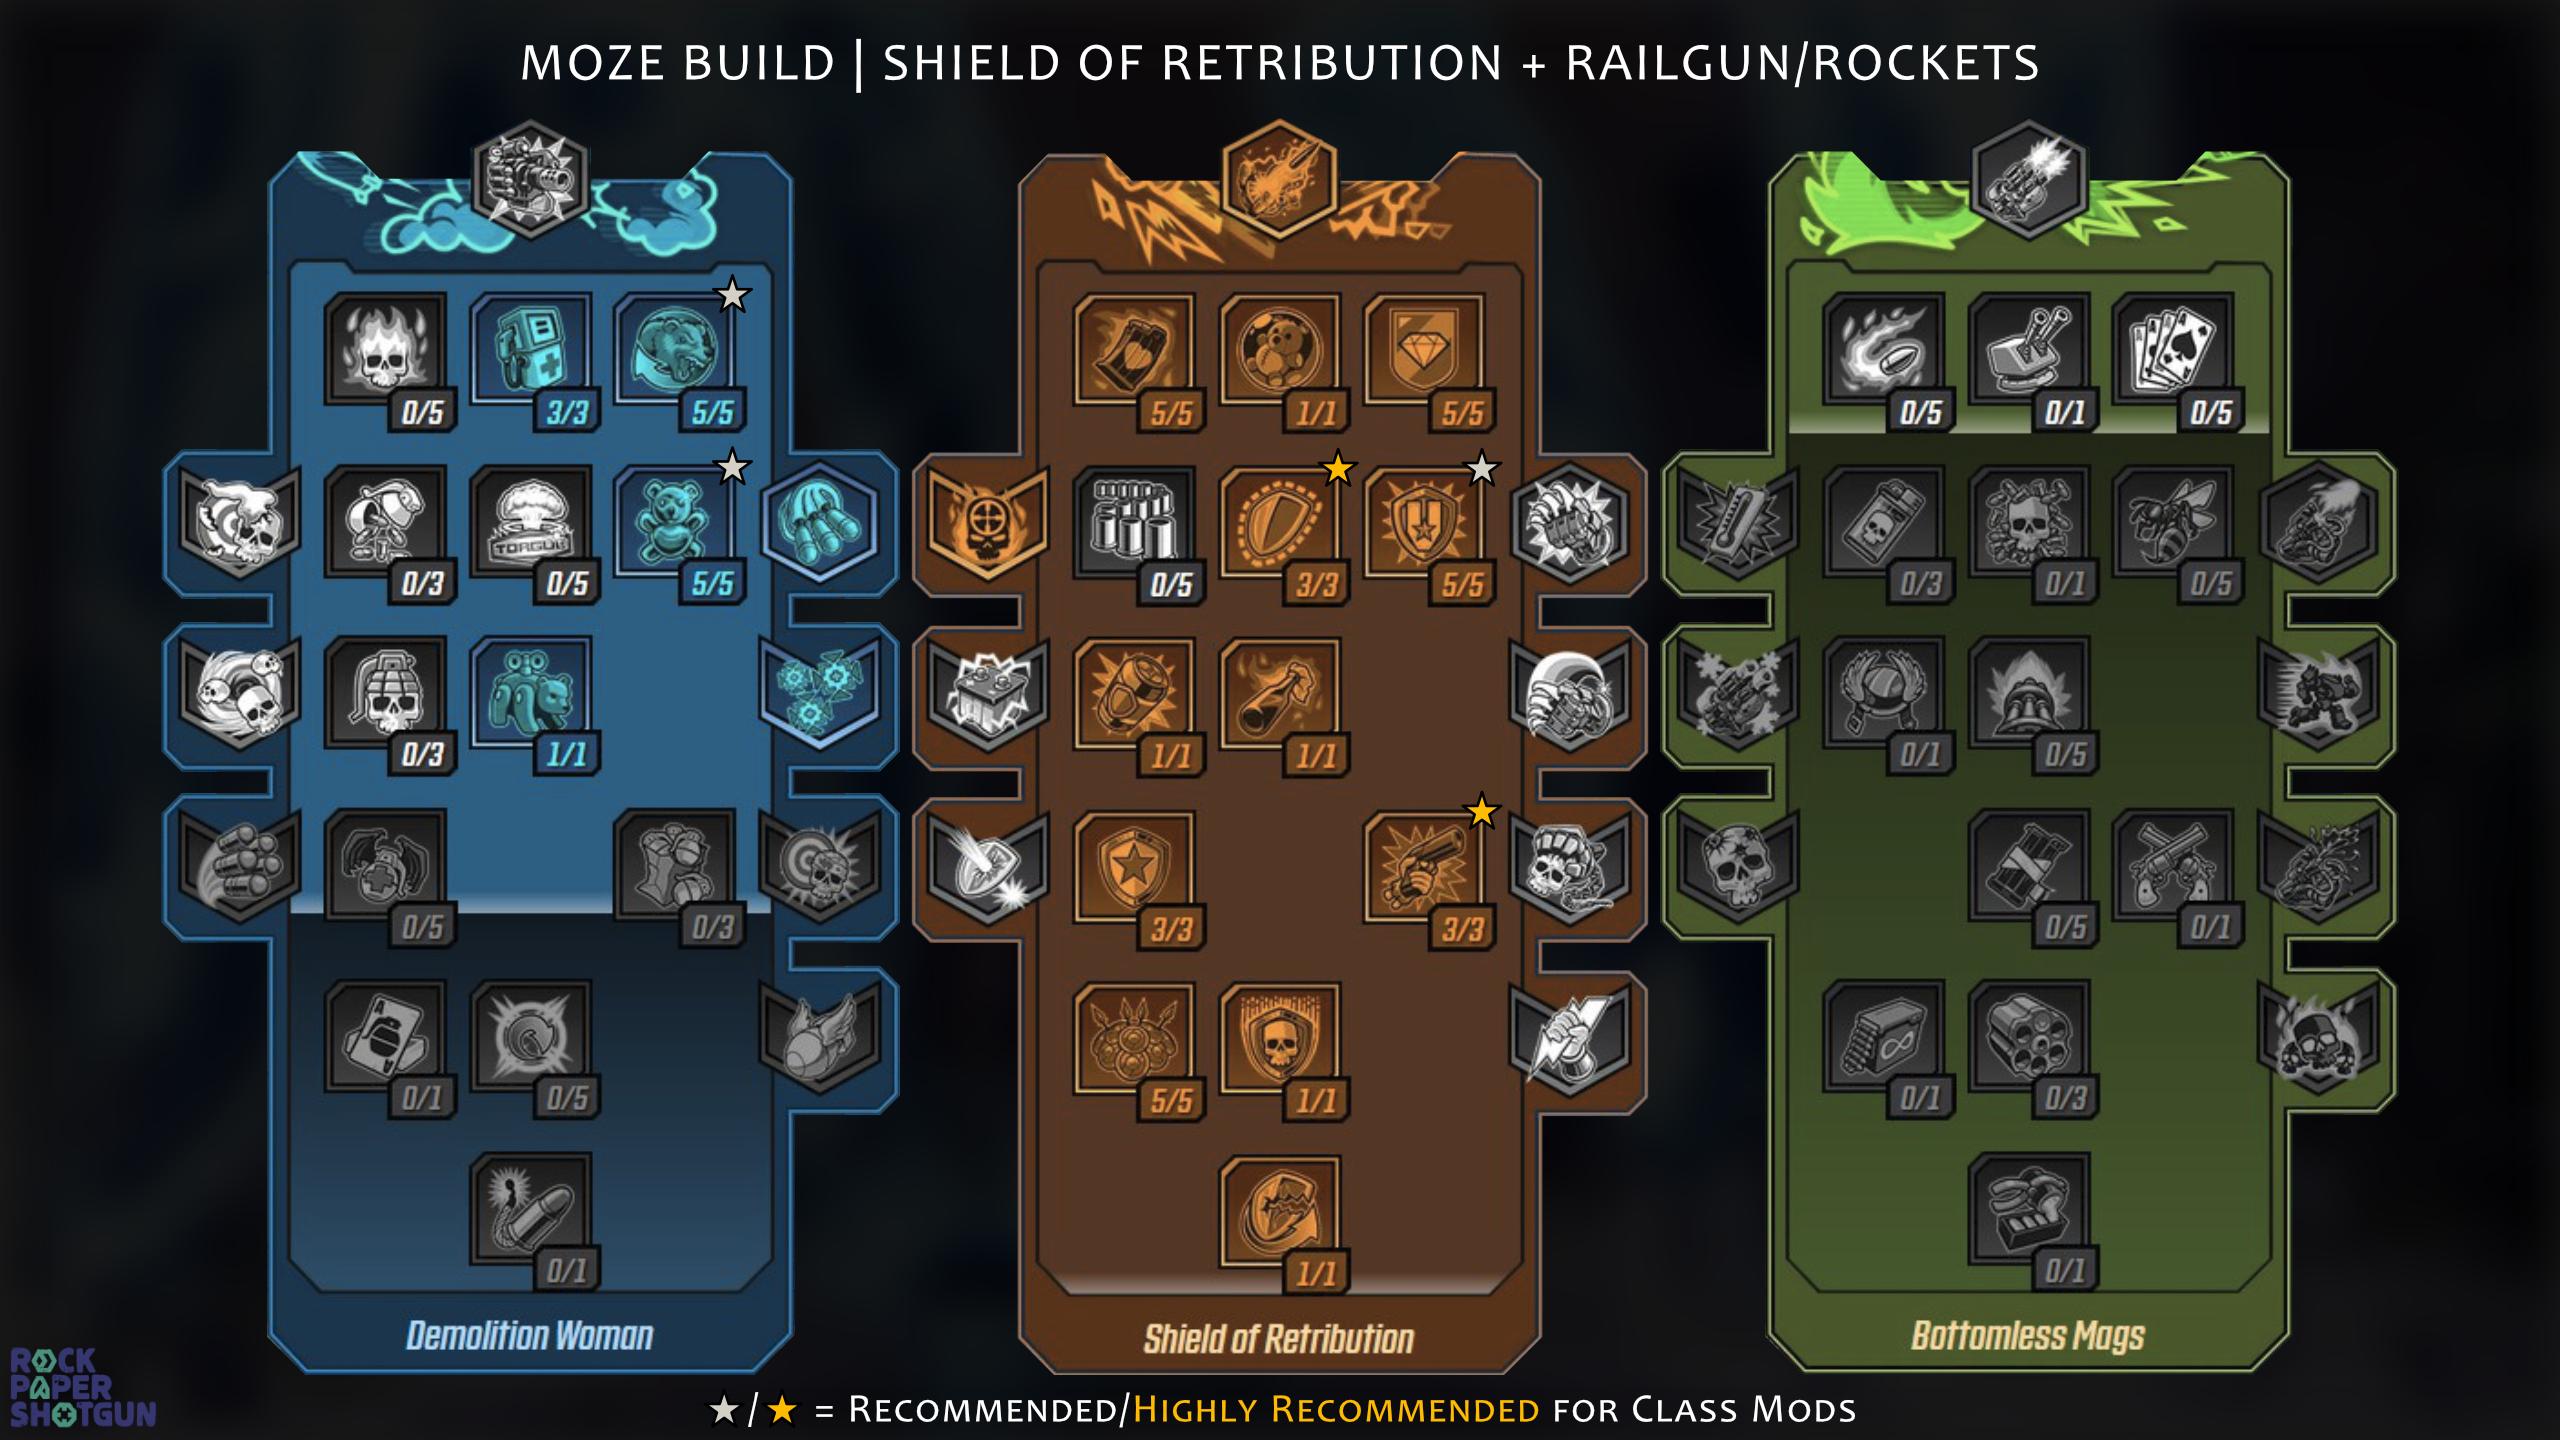 Borderlands 3 Moze build - Shield of Retribution & Railgun/Rockets